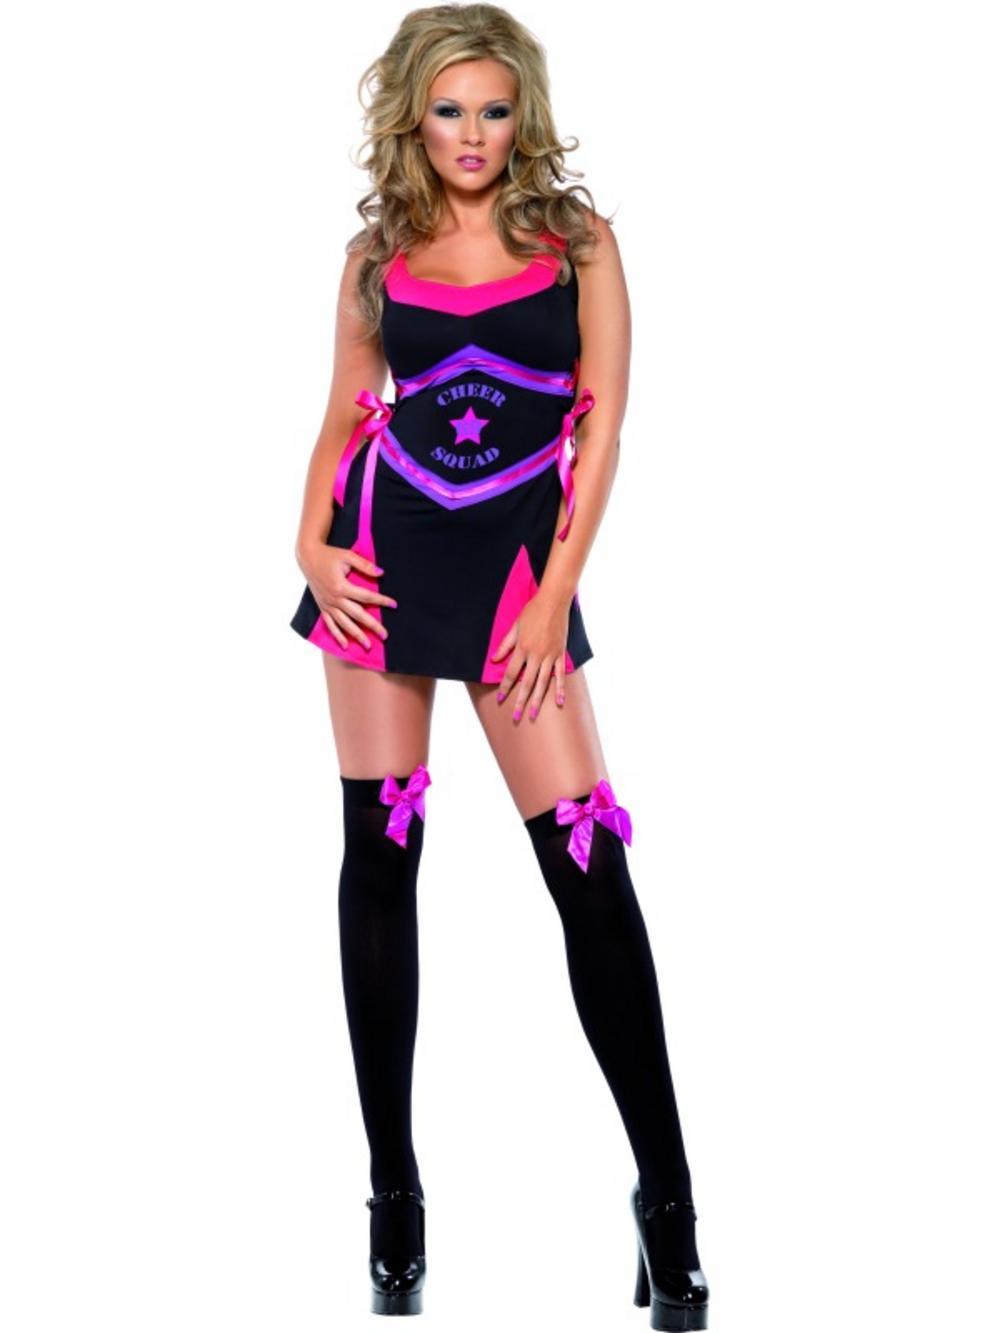 Sexy Fever Squad Cheerleader Costume